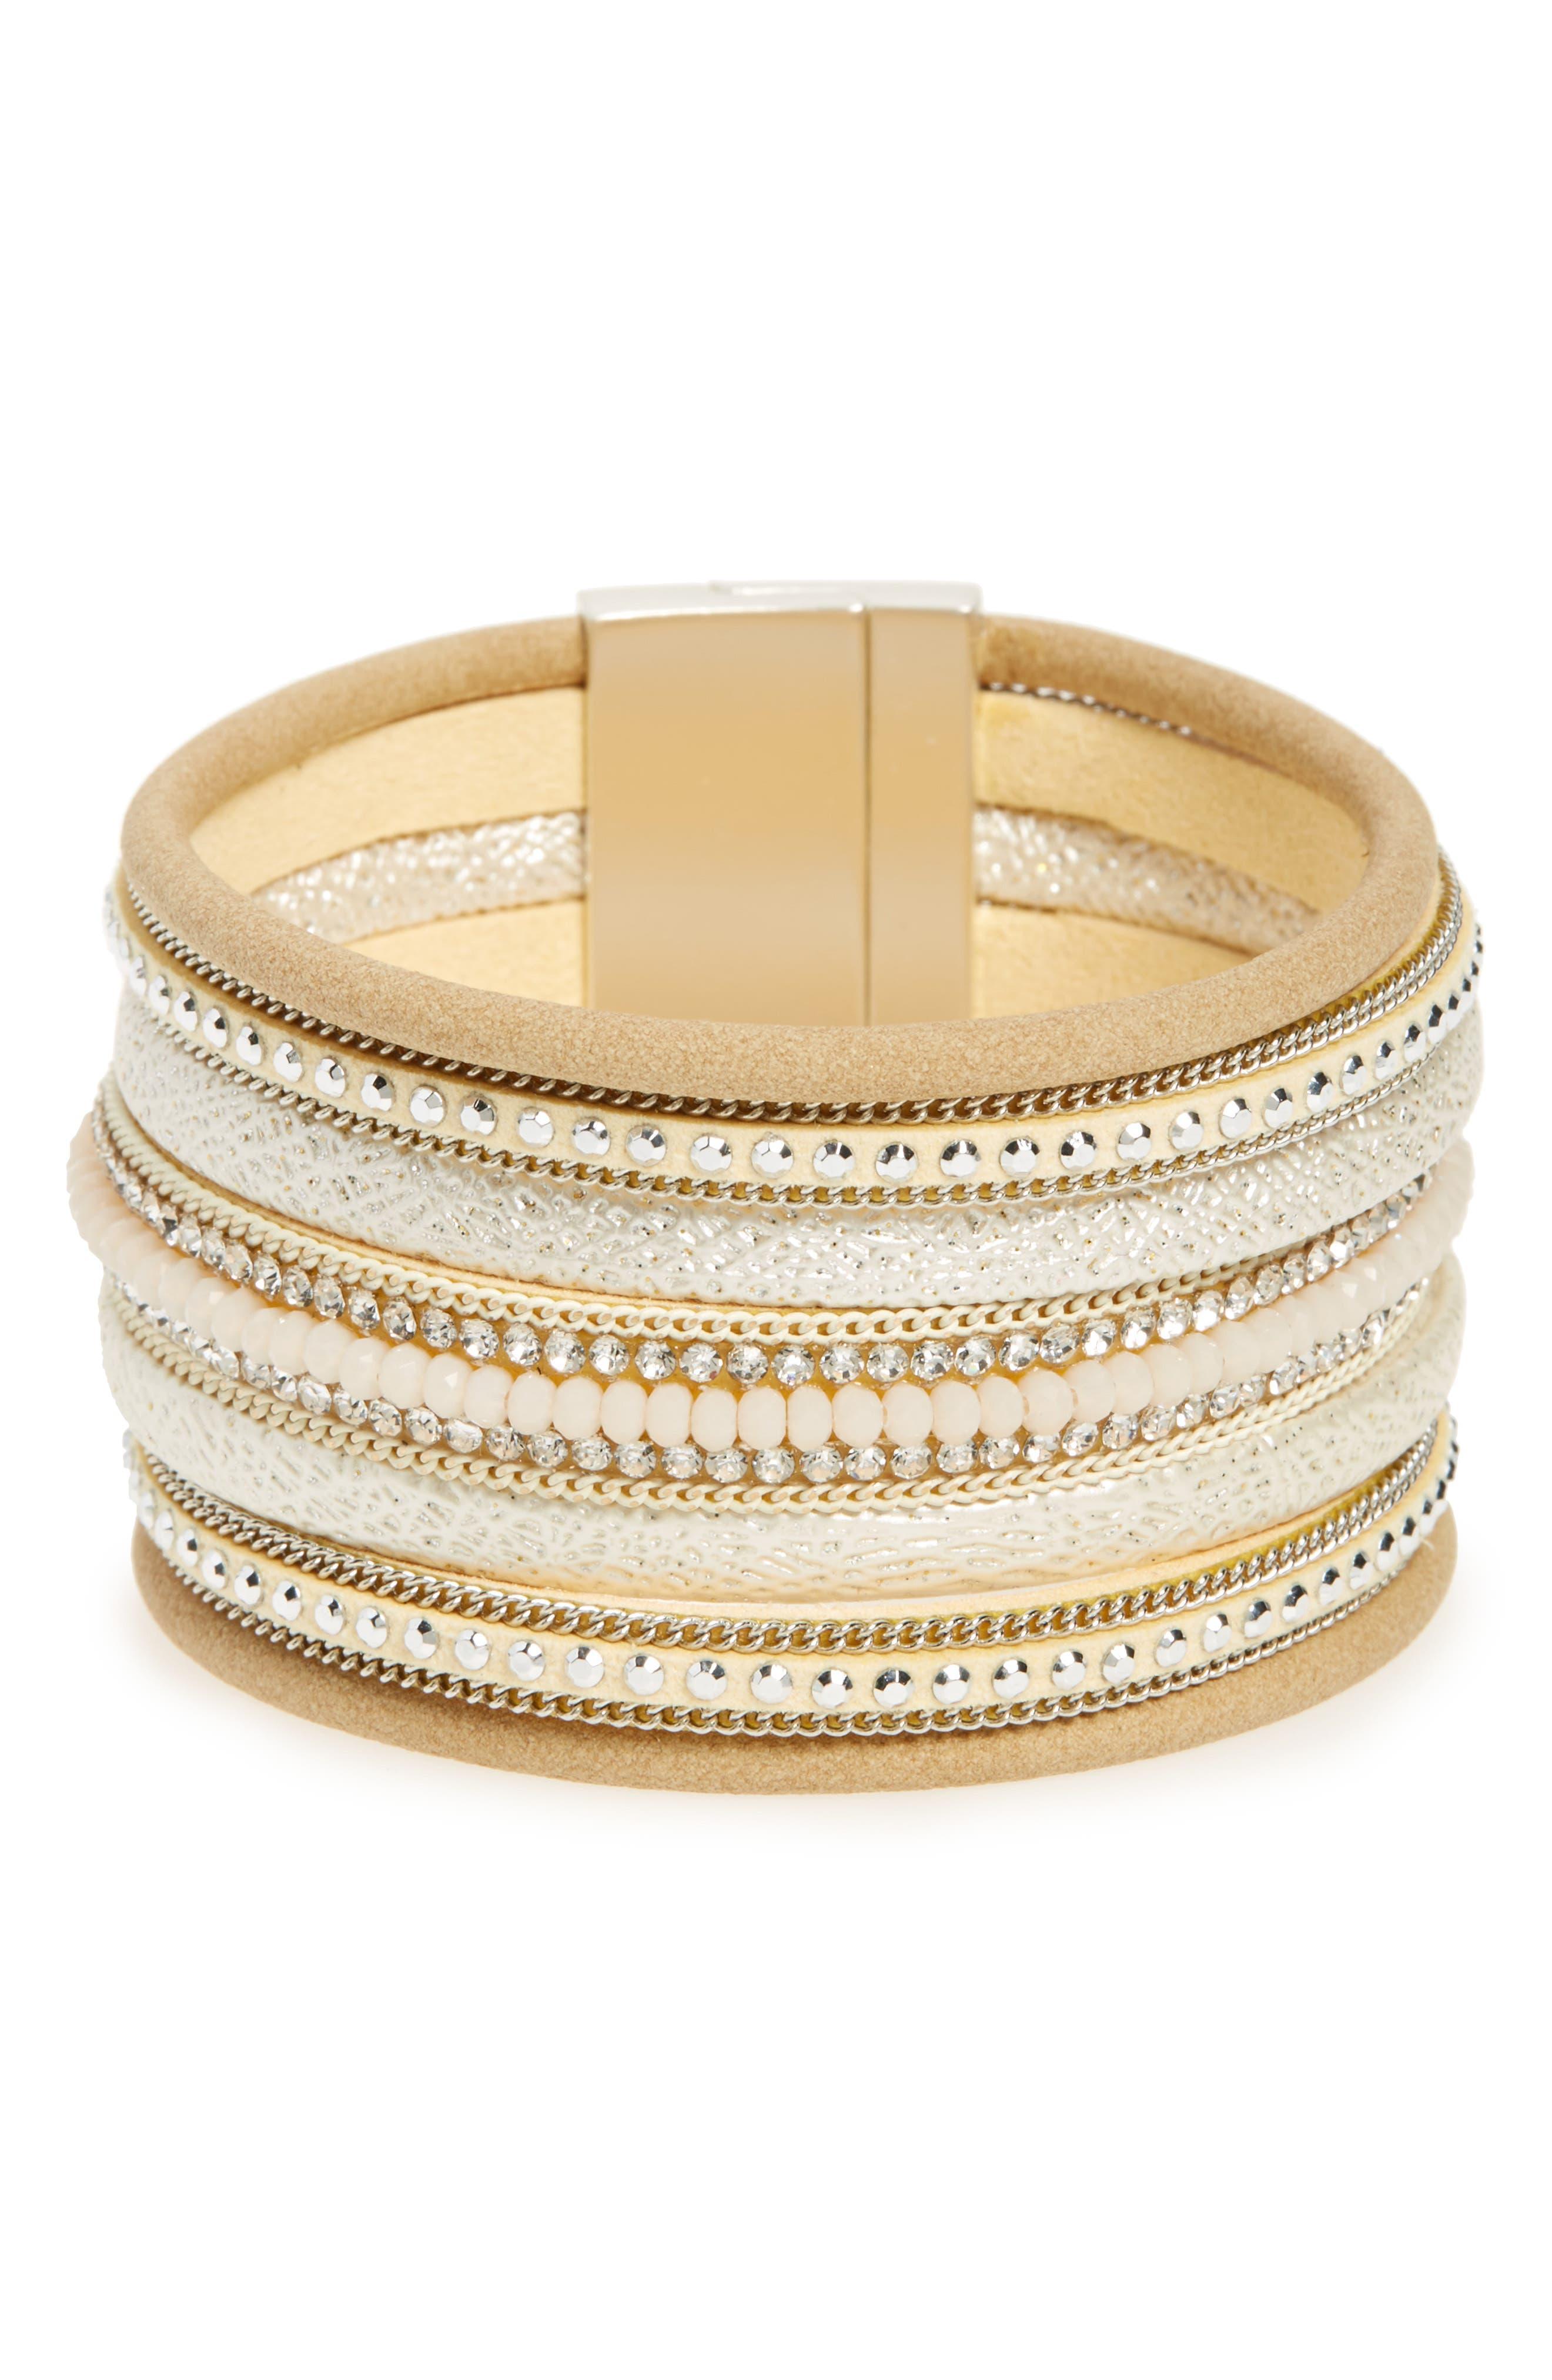 Alternate Image 1 Selected - Panacea Multirow Bracelet